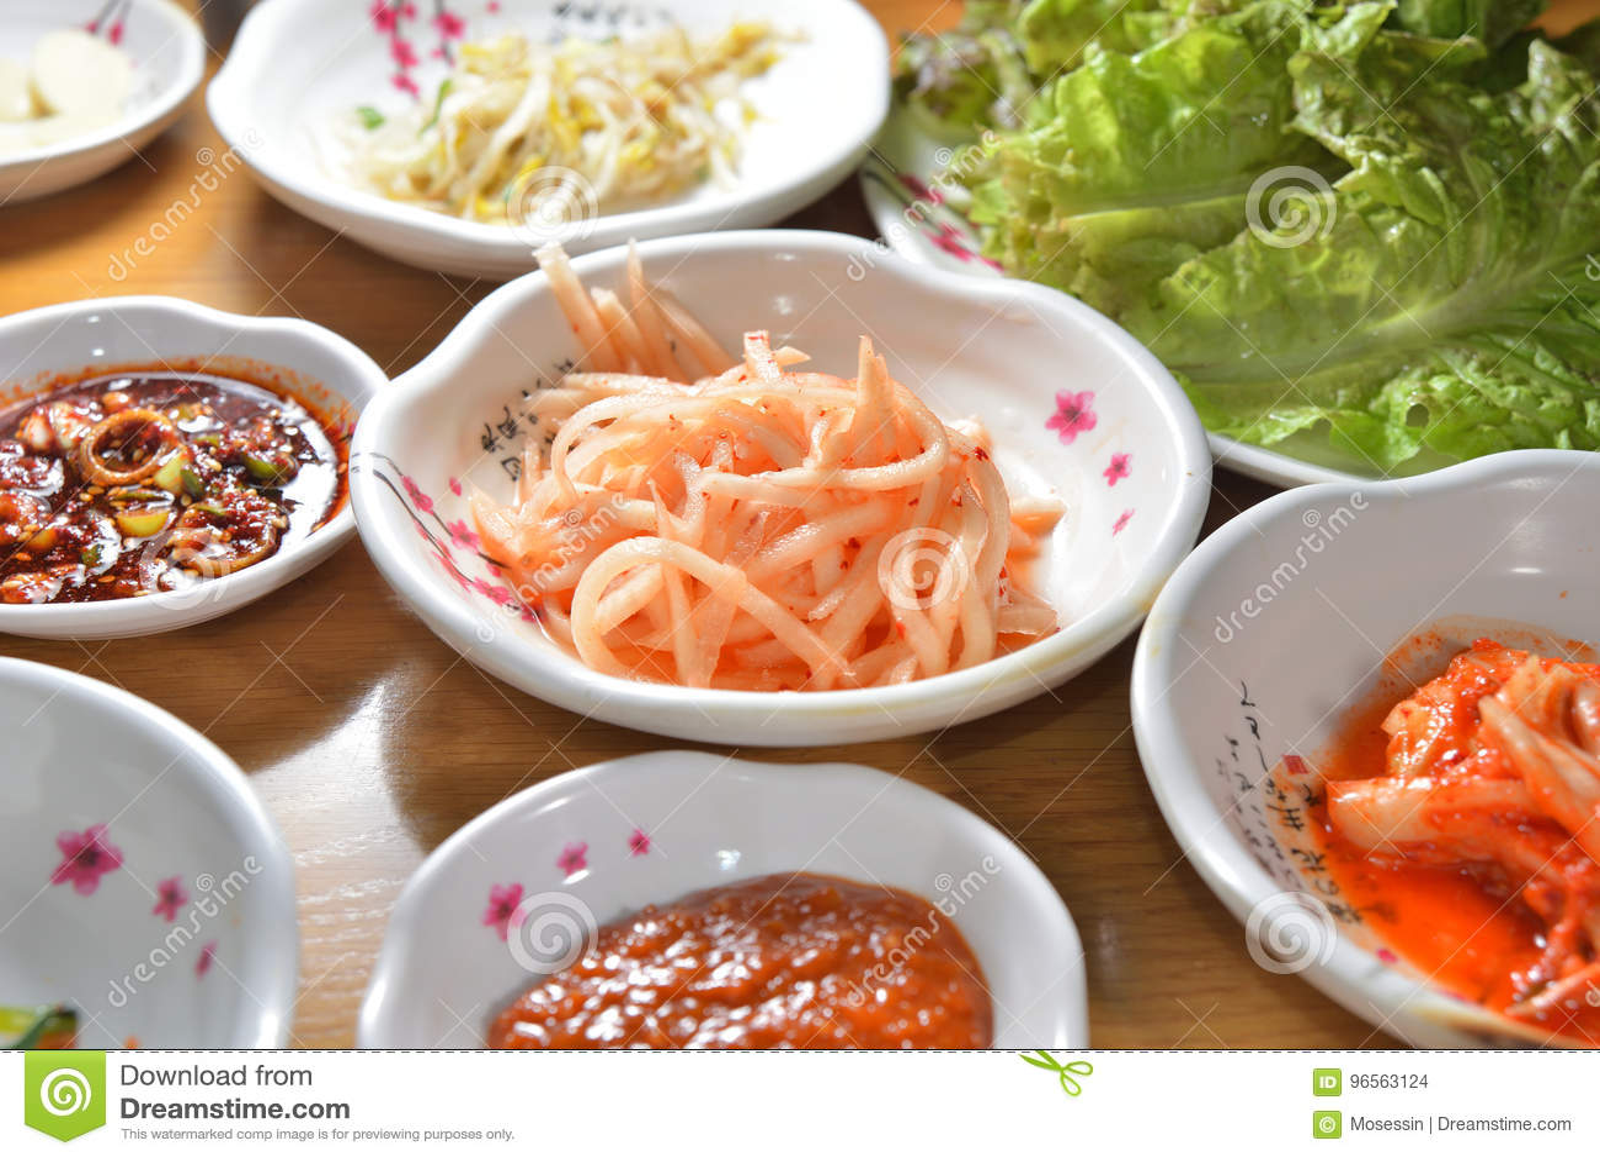 Plat coréen de kimchi